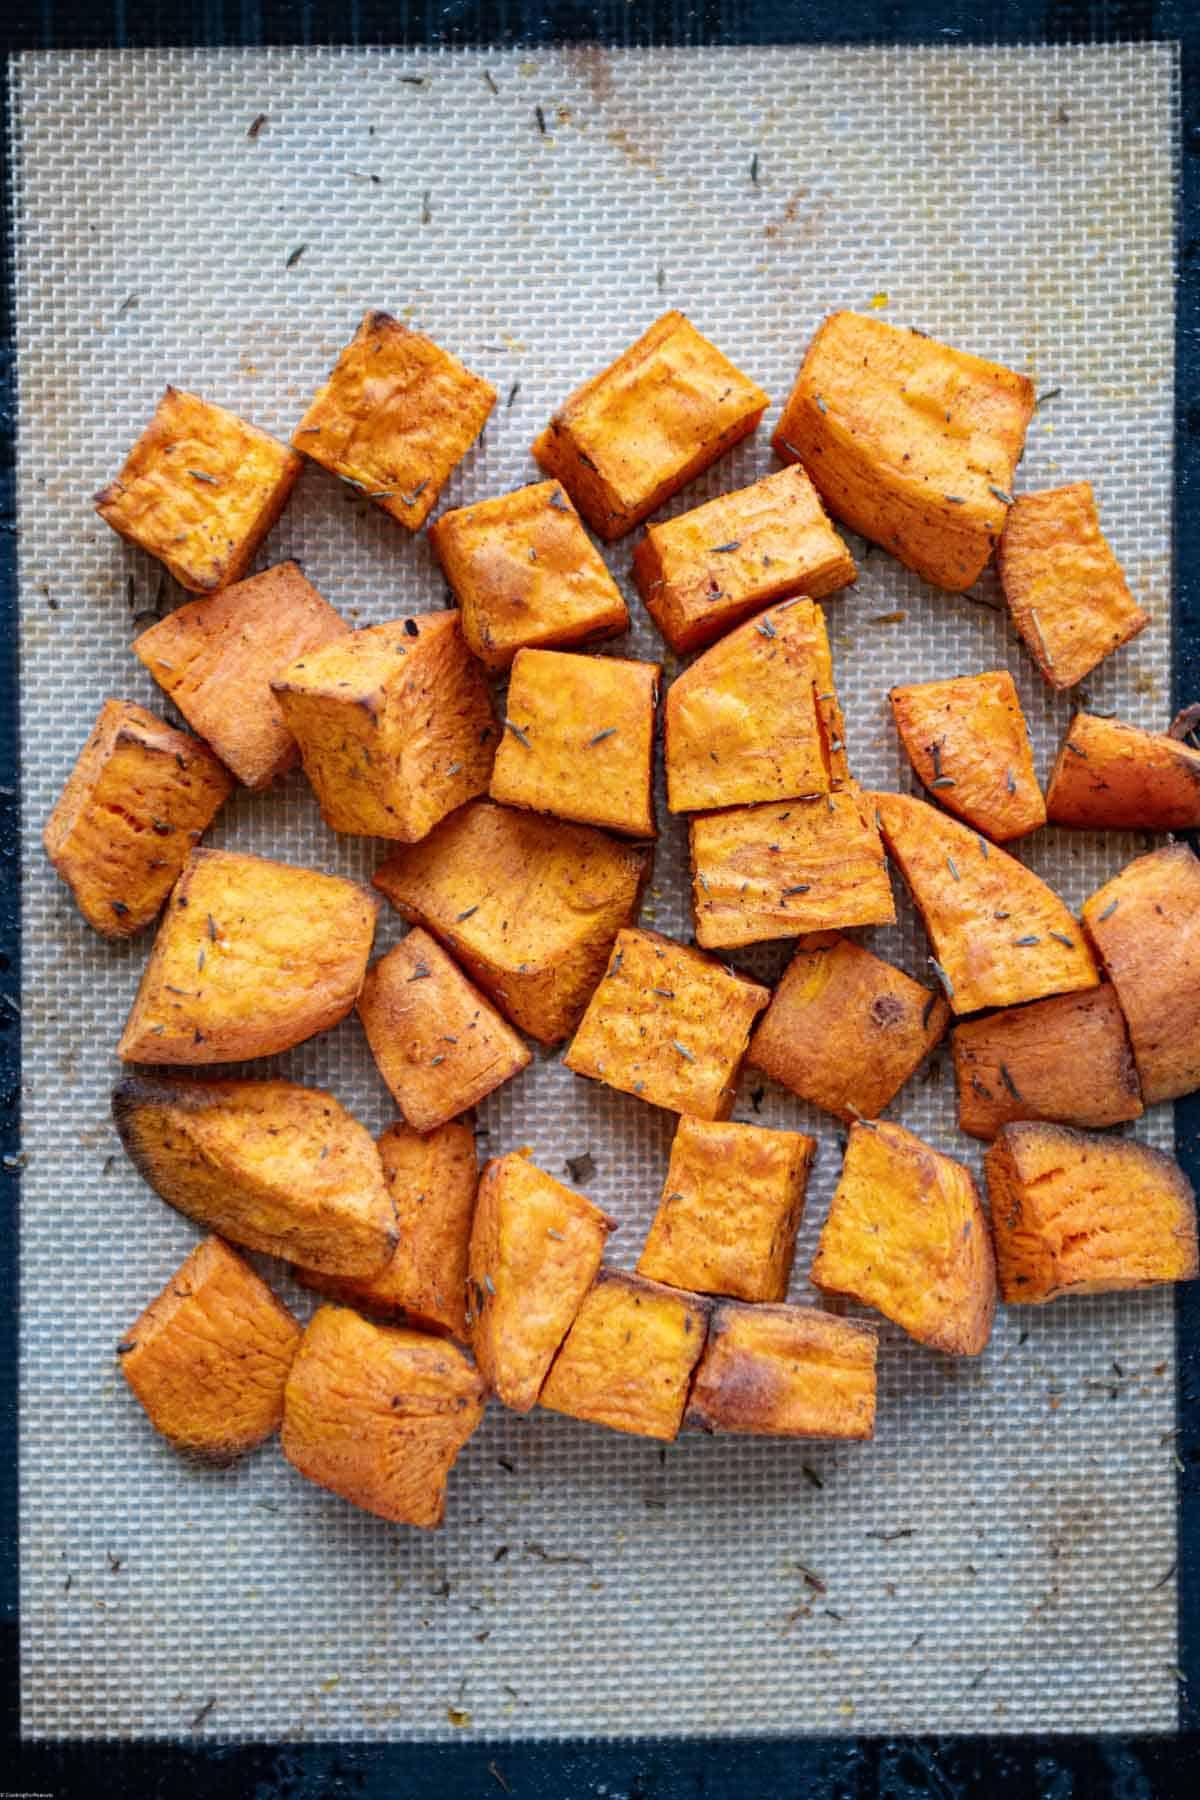 Roasted sweet potato on a baking sheet.